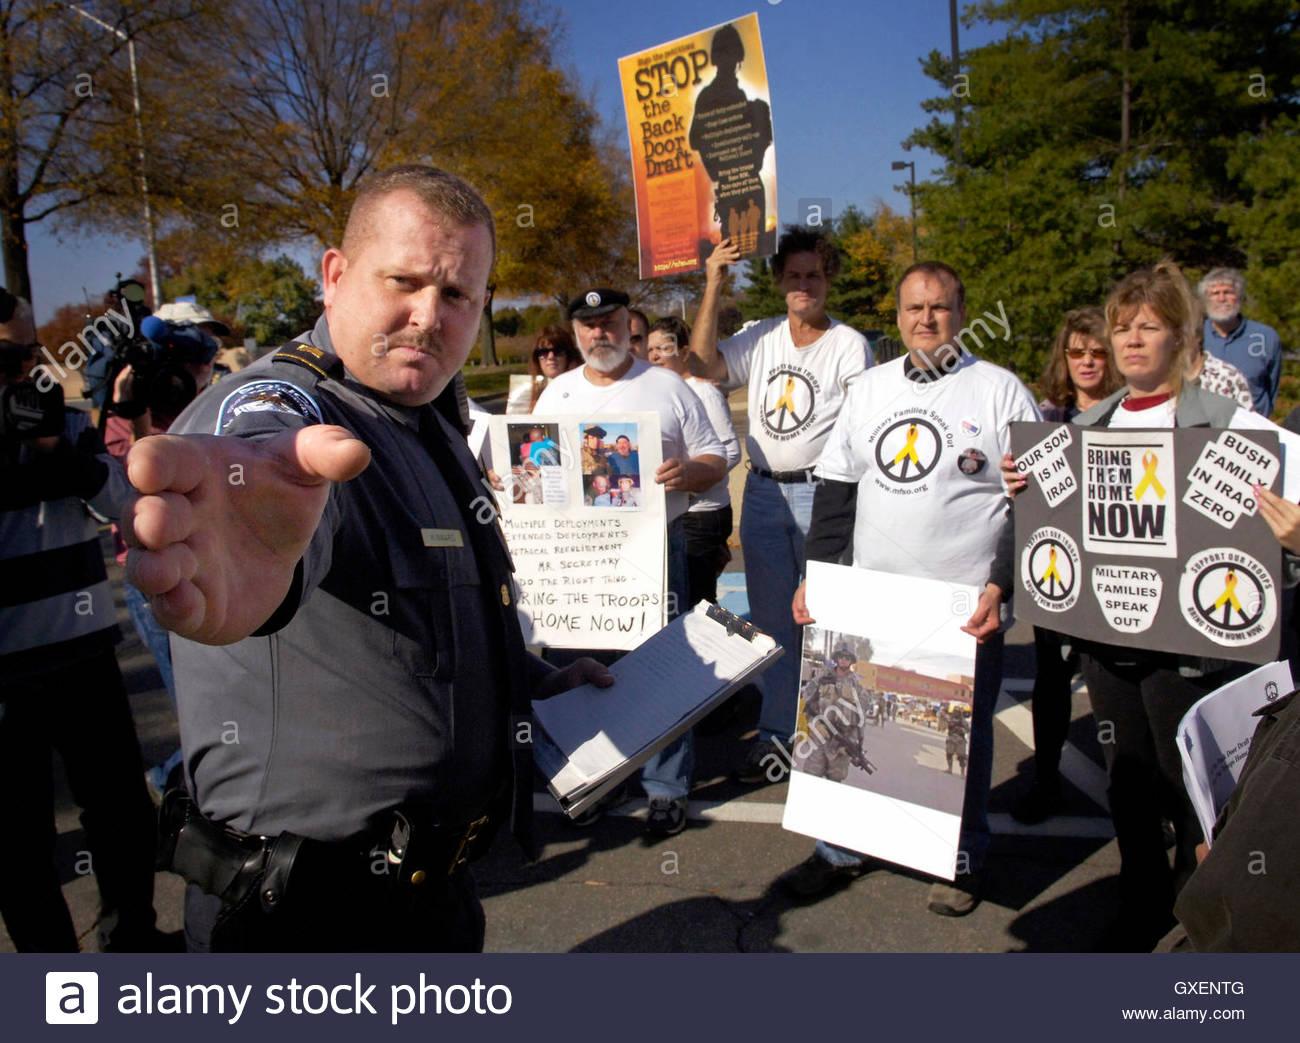 Sergeant John Kinnard (L) of the Pentagon police force directs ...